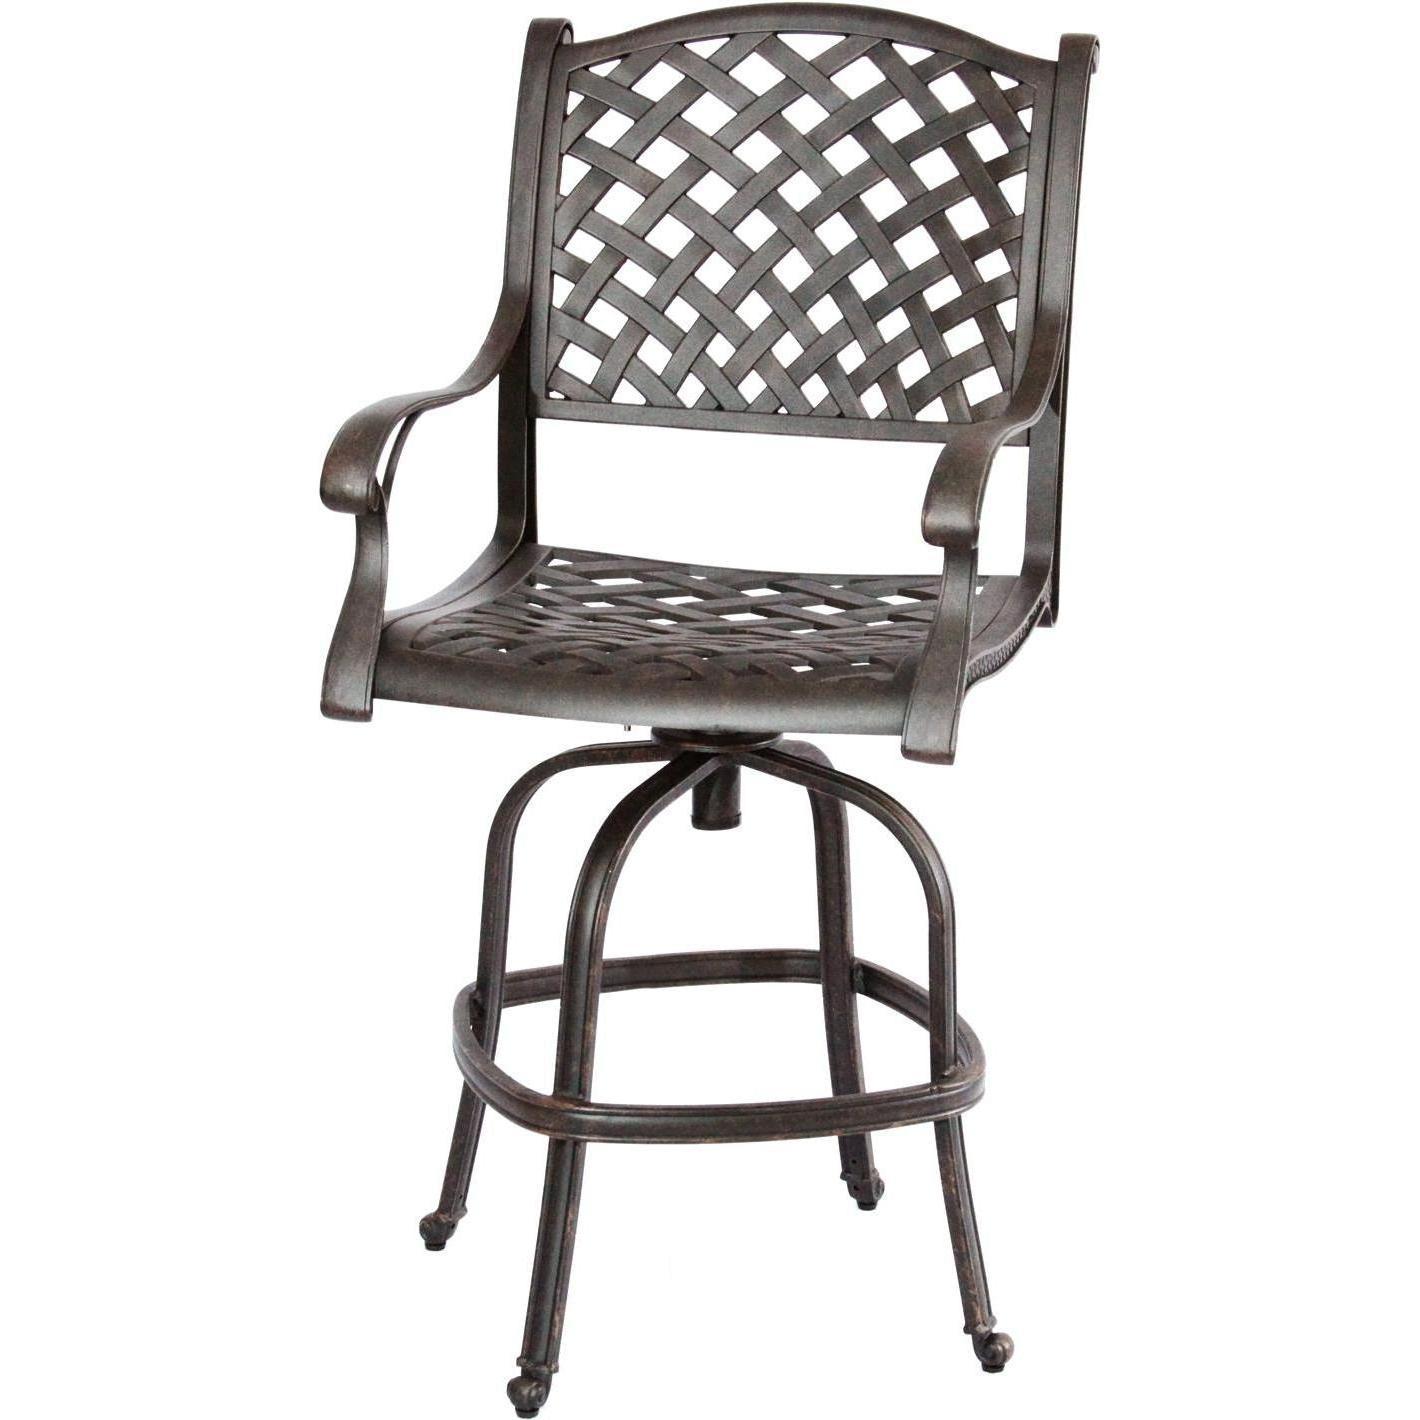 Fine Darlee Nassau Cast Aluminum Patio Swivel Bar Stool In 2019 Squirreltailoven Fun Painted Chair Ideas Images Squirreltailovenorg